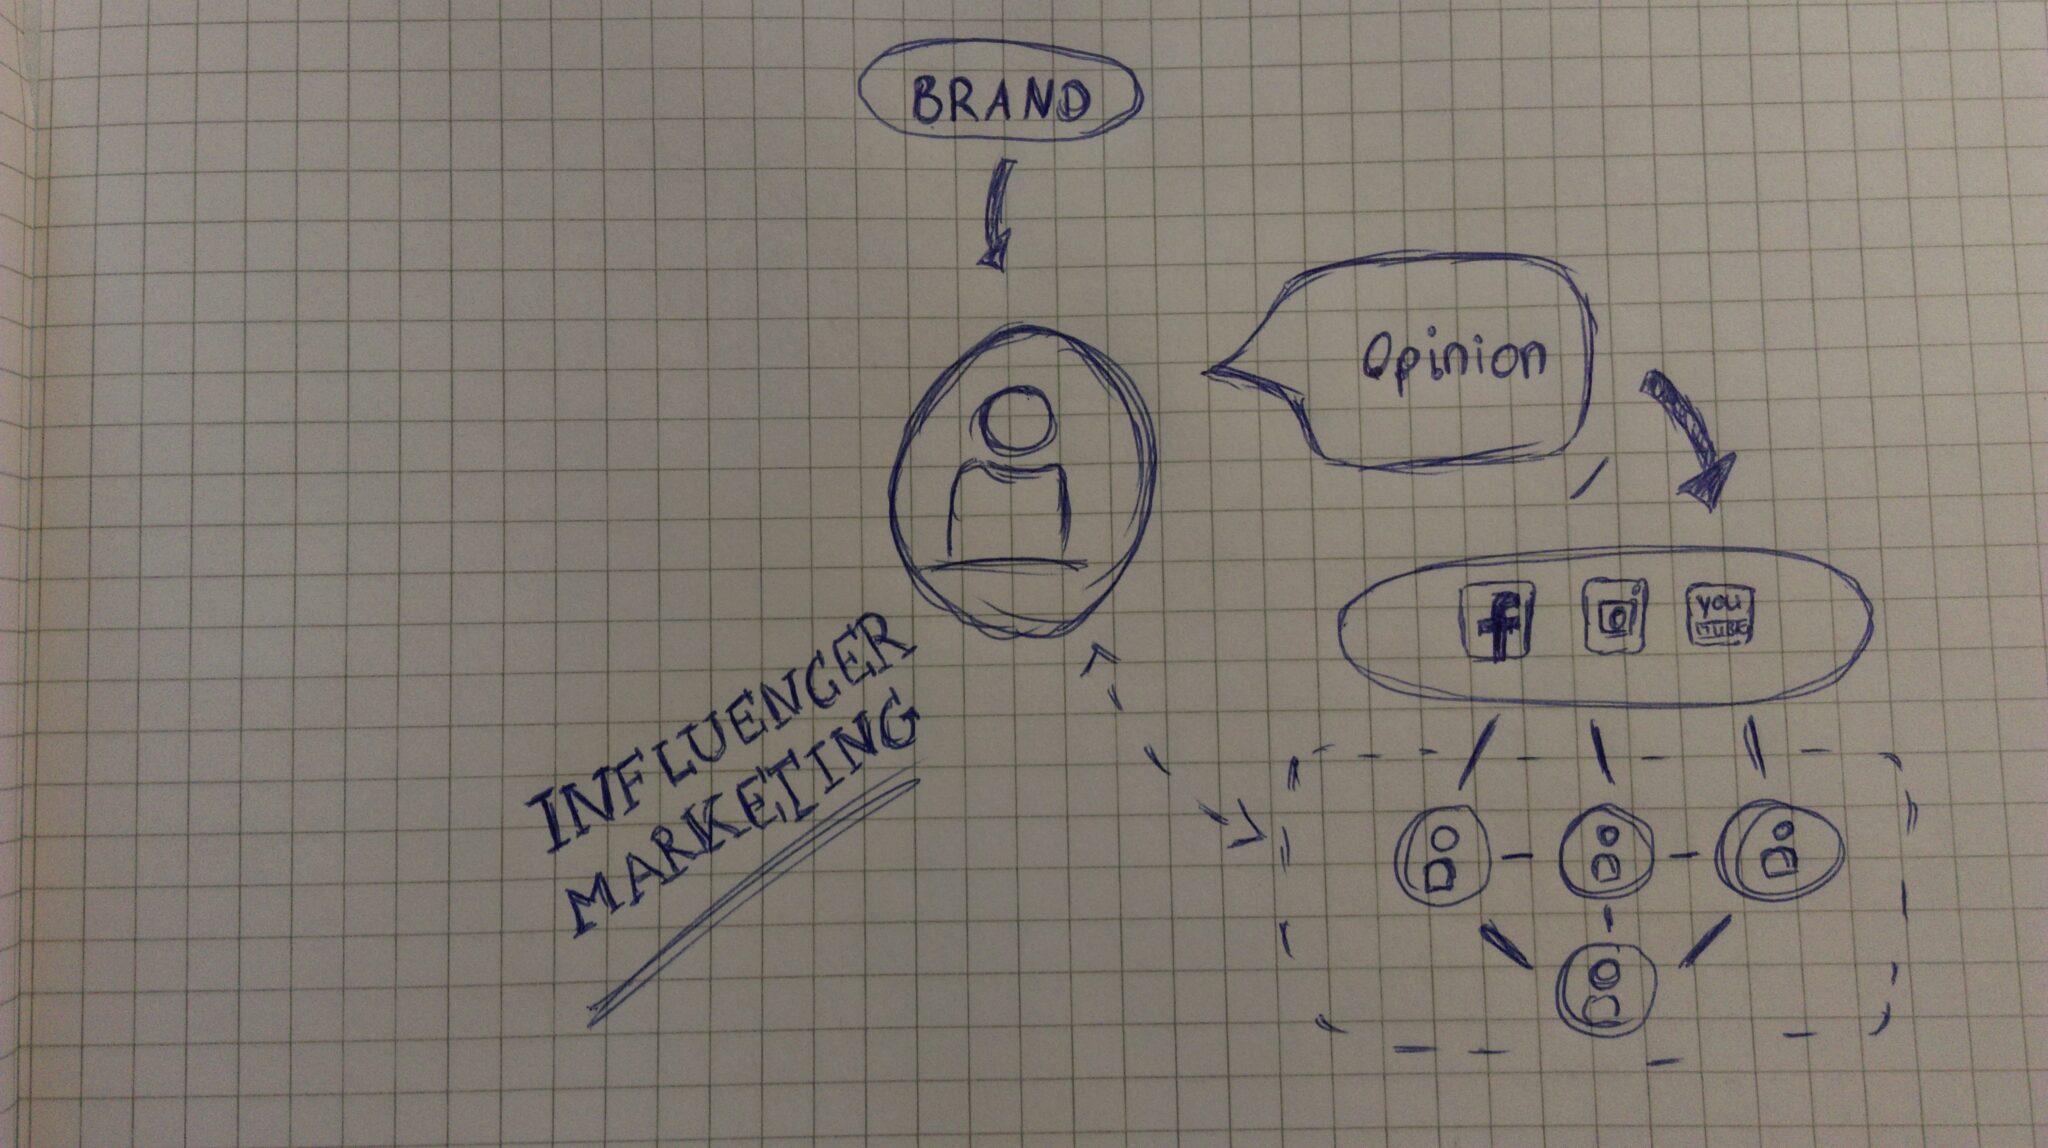 Funktionsprinzip des Influencer Marktings